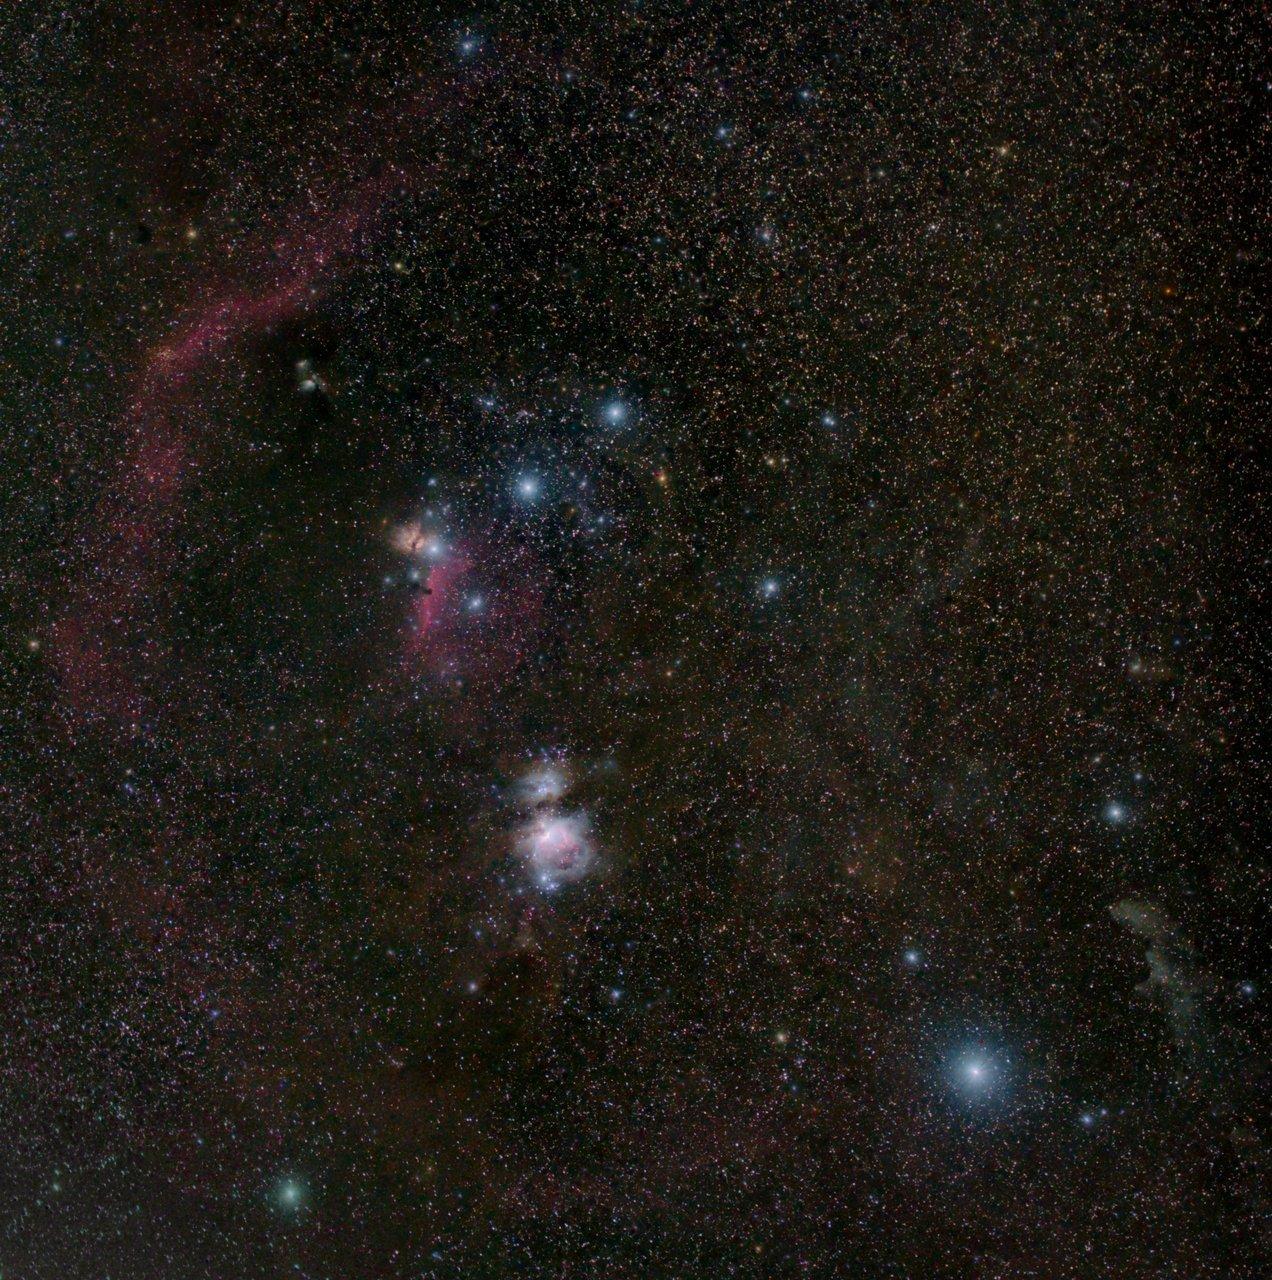 Съзвездие Орион от Radoslav Sotirov - RBSotirov